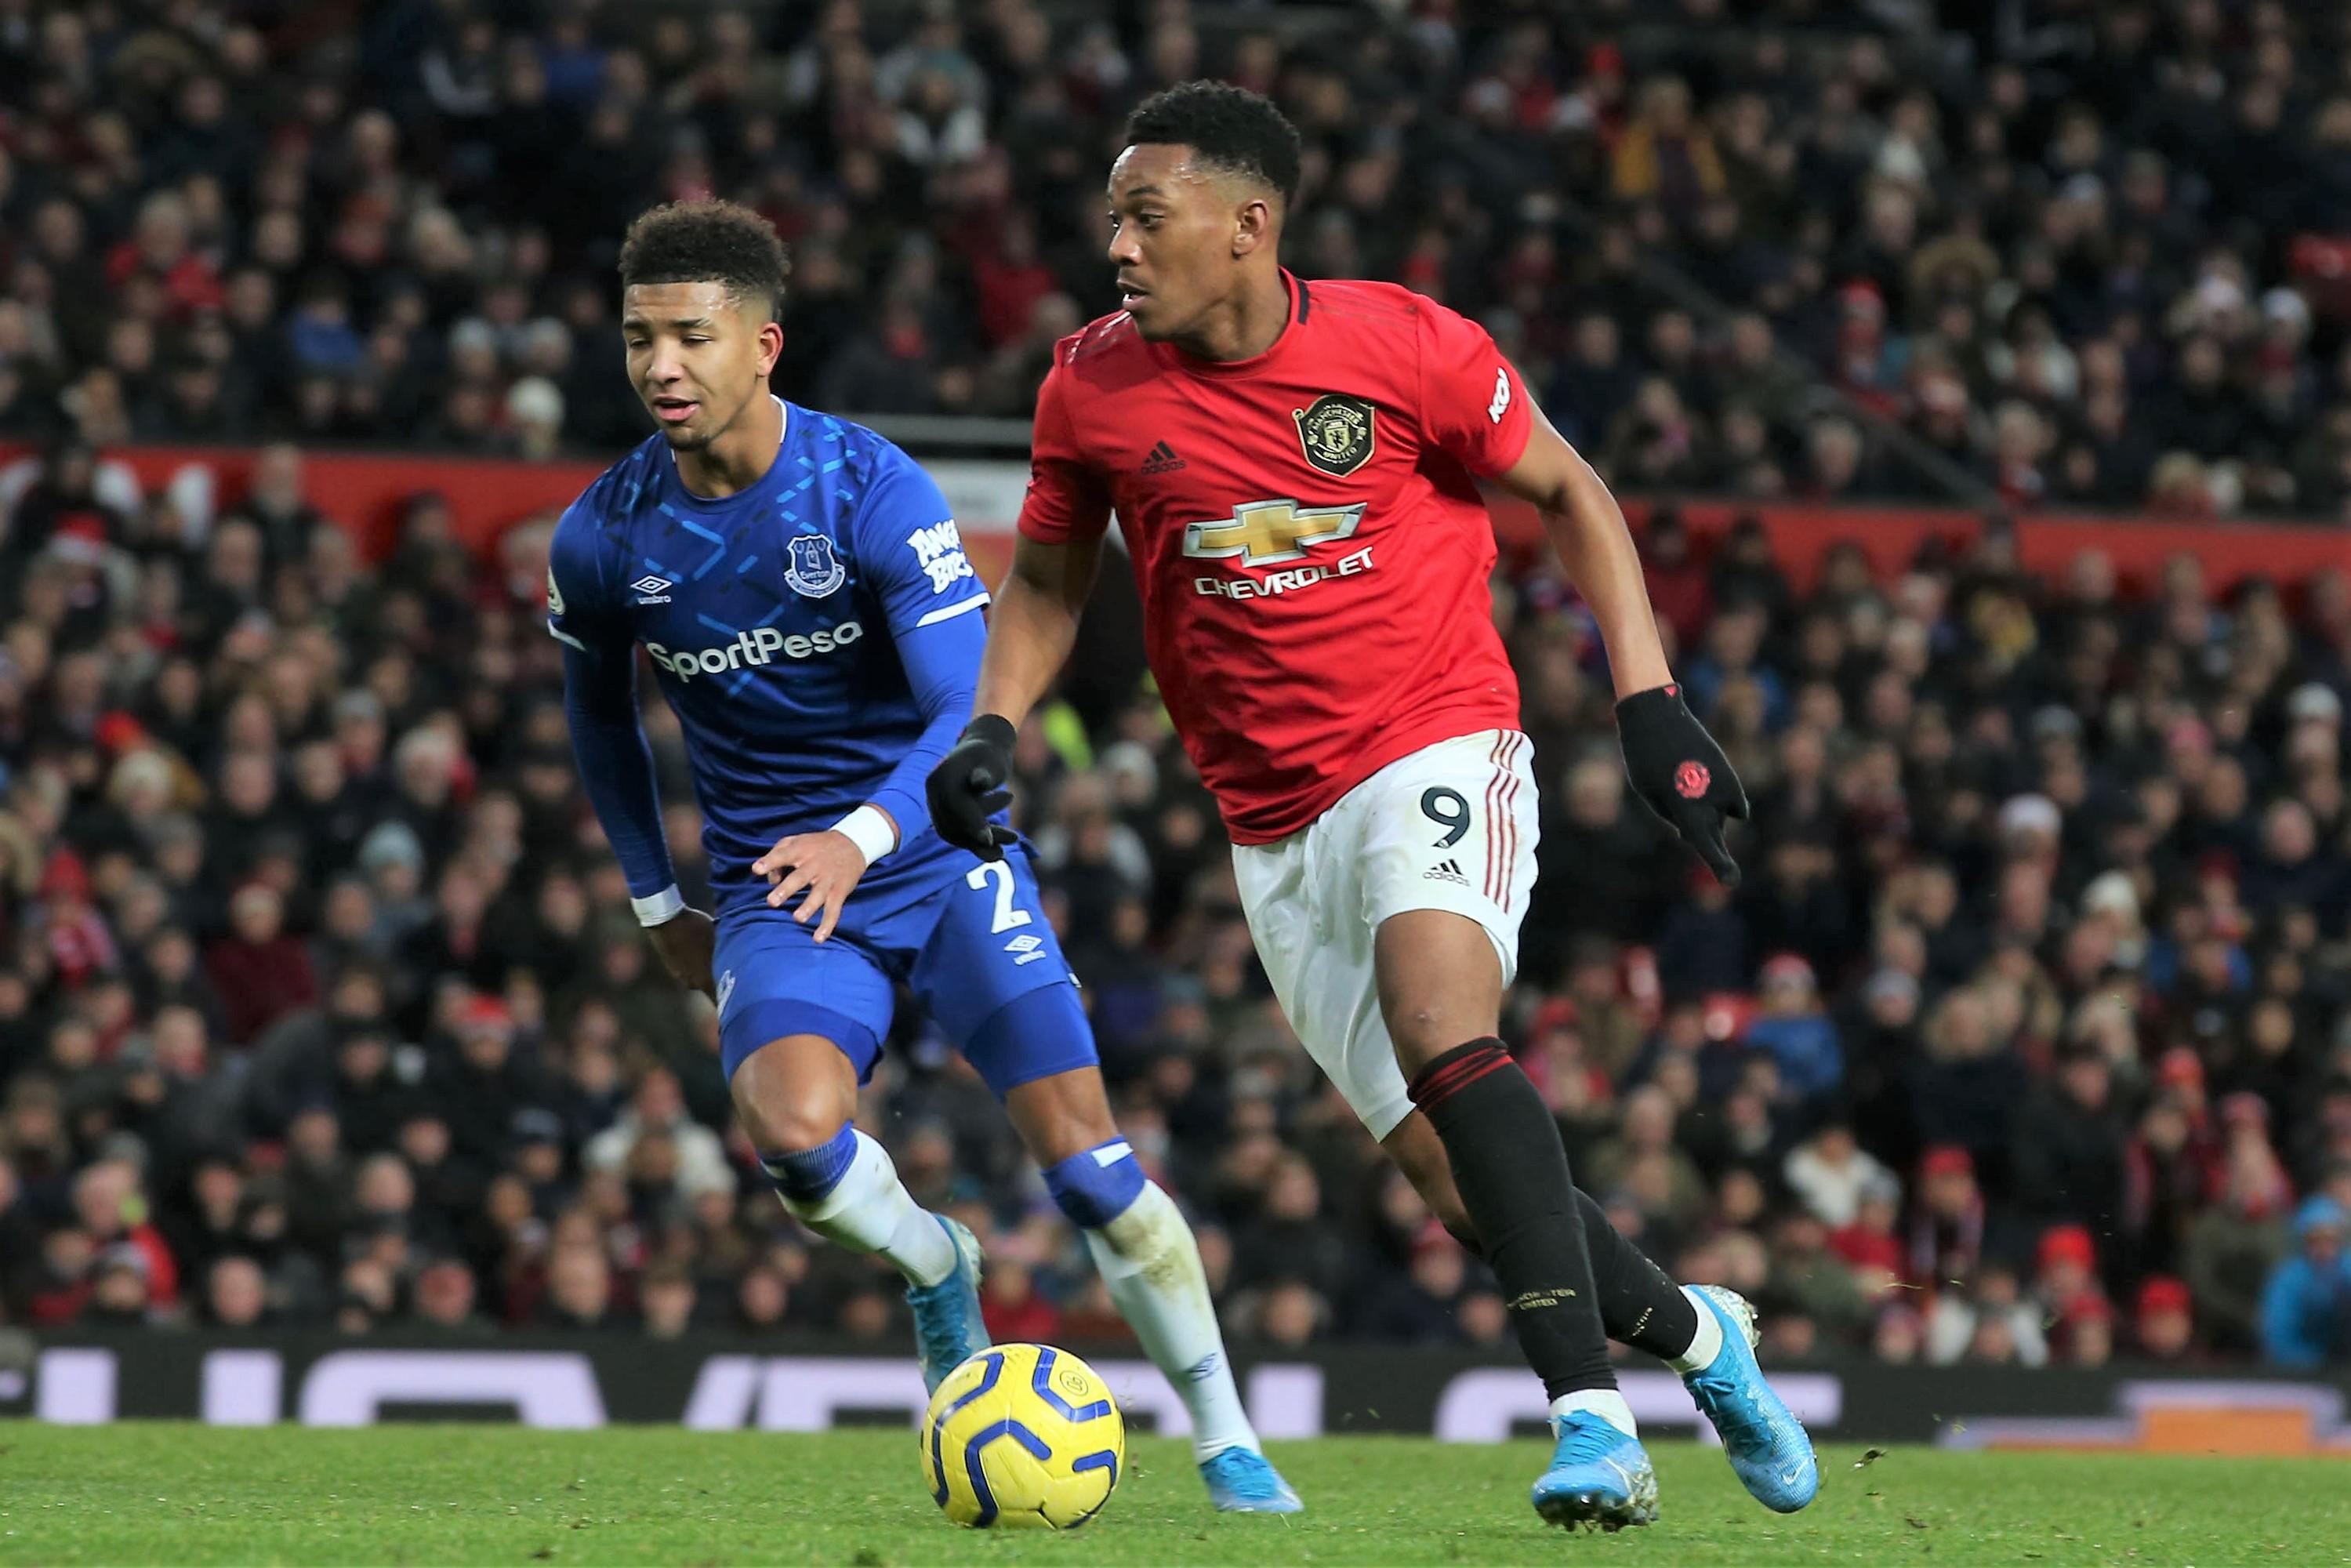 Everton V Man Utd Martial A Doubt